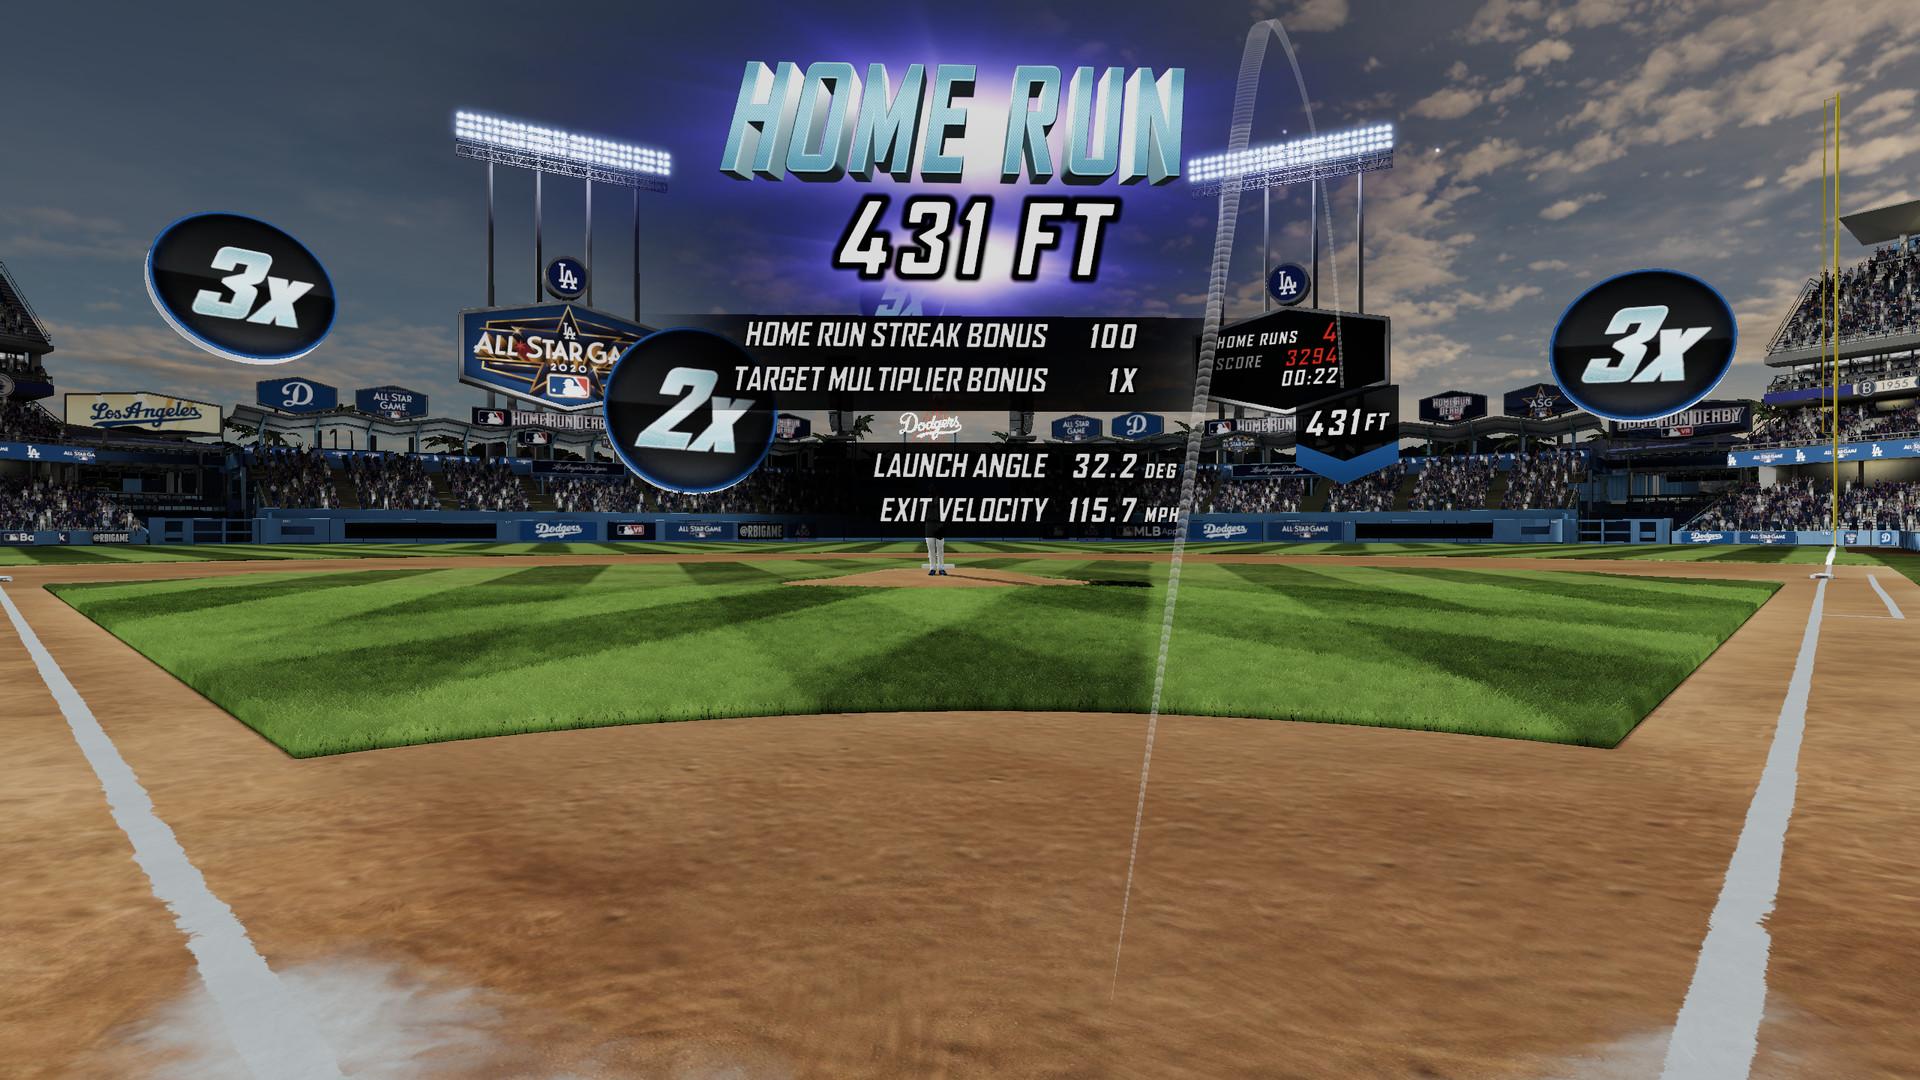 Oculus Quest 游戏《MLB Home Run Derby VR!》美国职棒大联盟本垒打 VR插图(1)